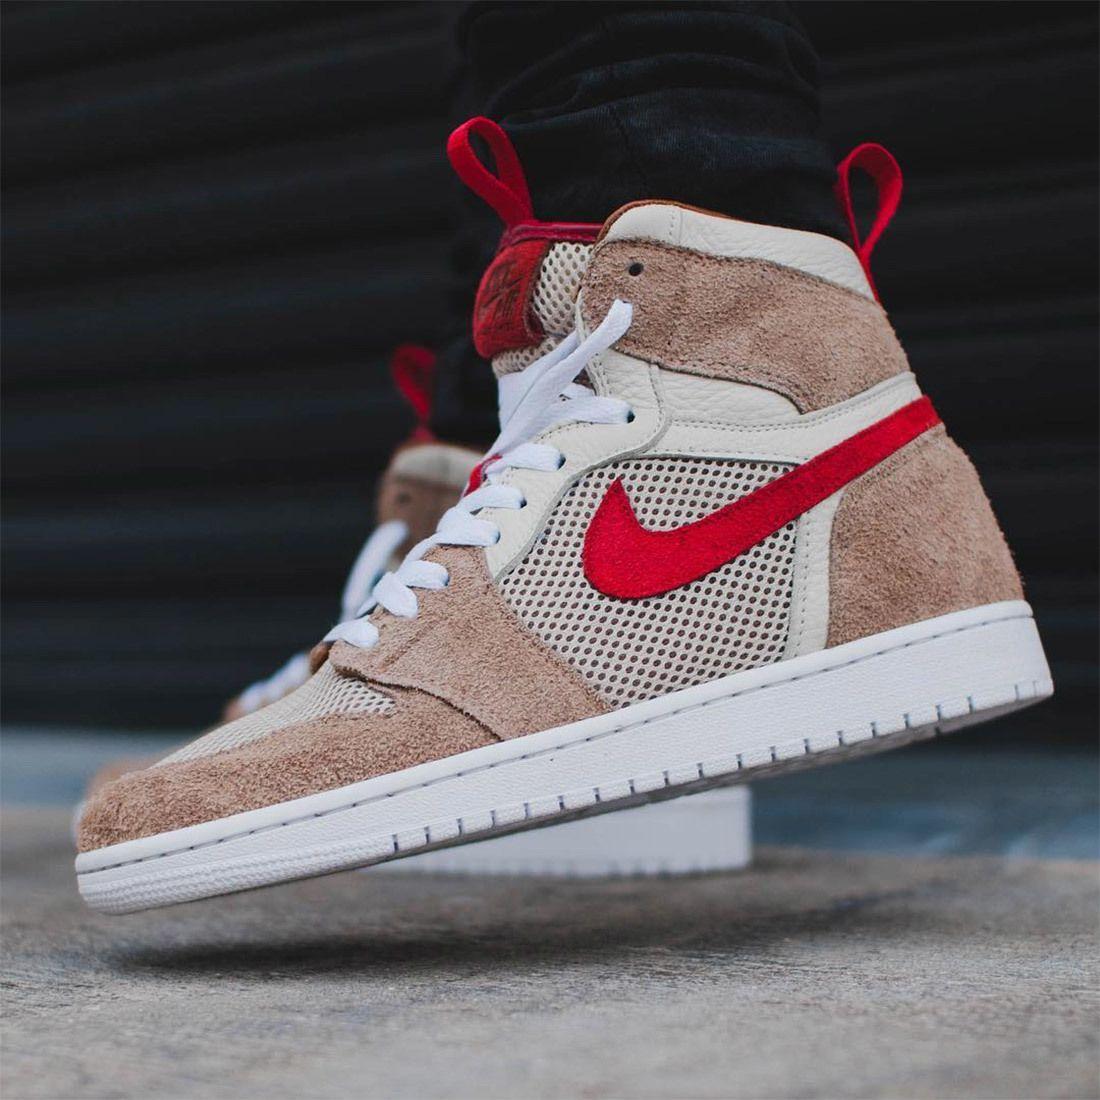 Customiser Makes 'Mars Yard' Air Jordan